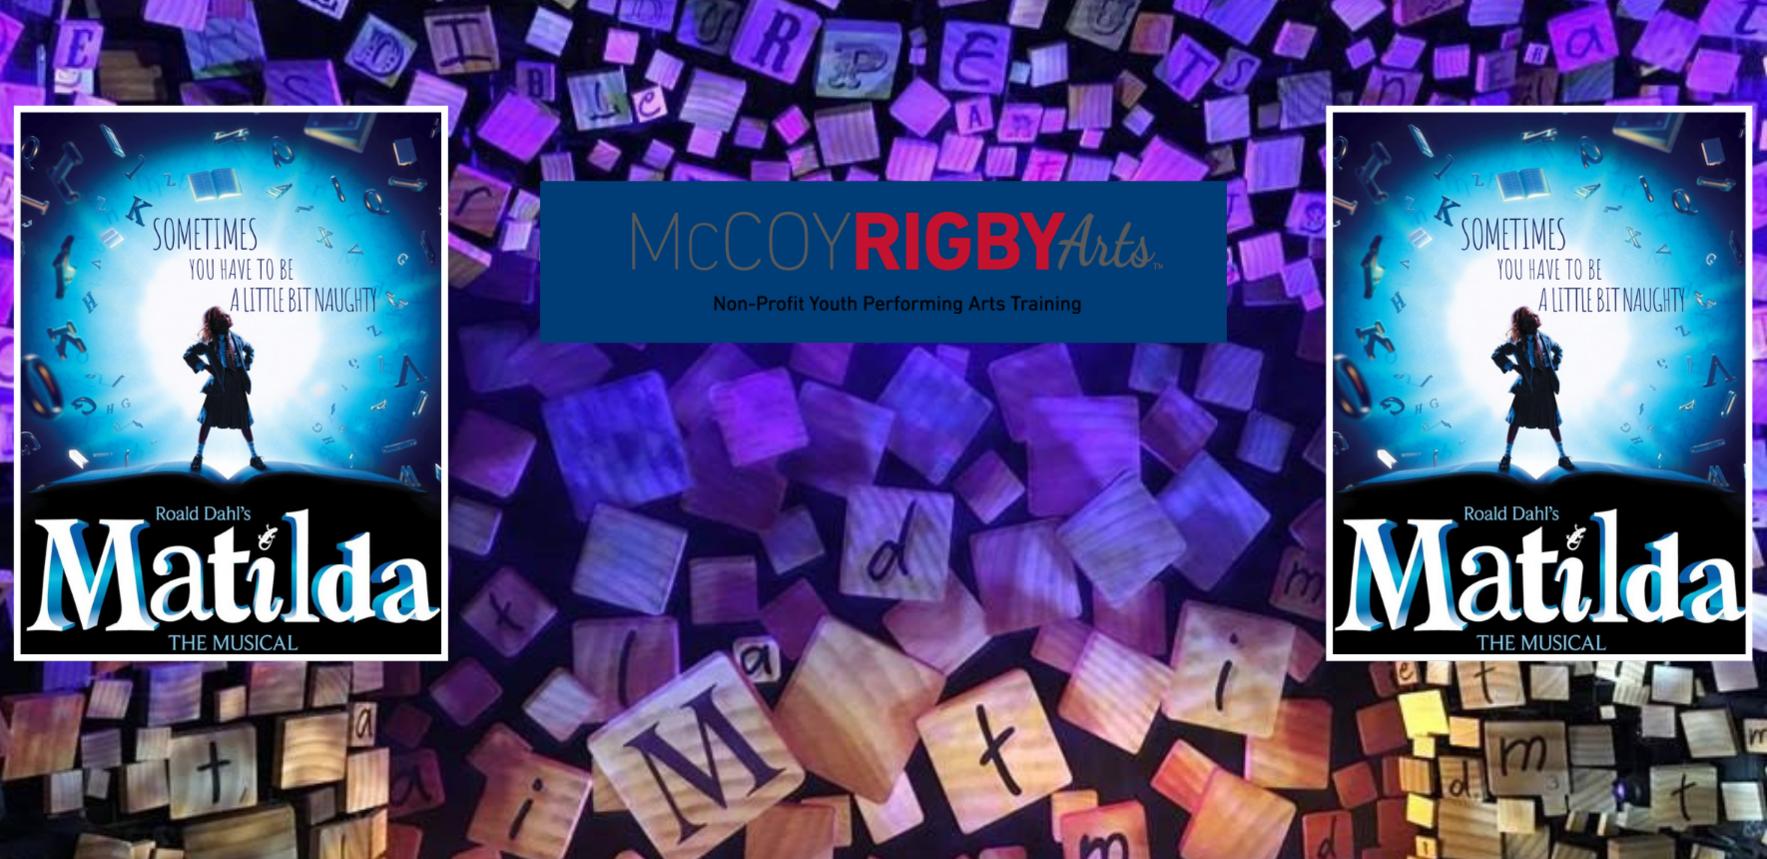 McCoy Rigby Arts Presents Roald Dahl's Matilda the Musical image